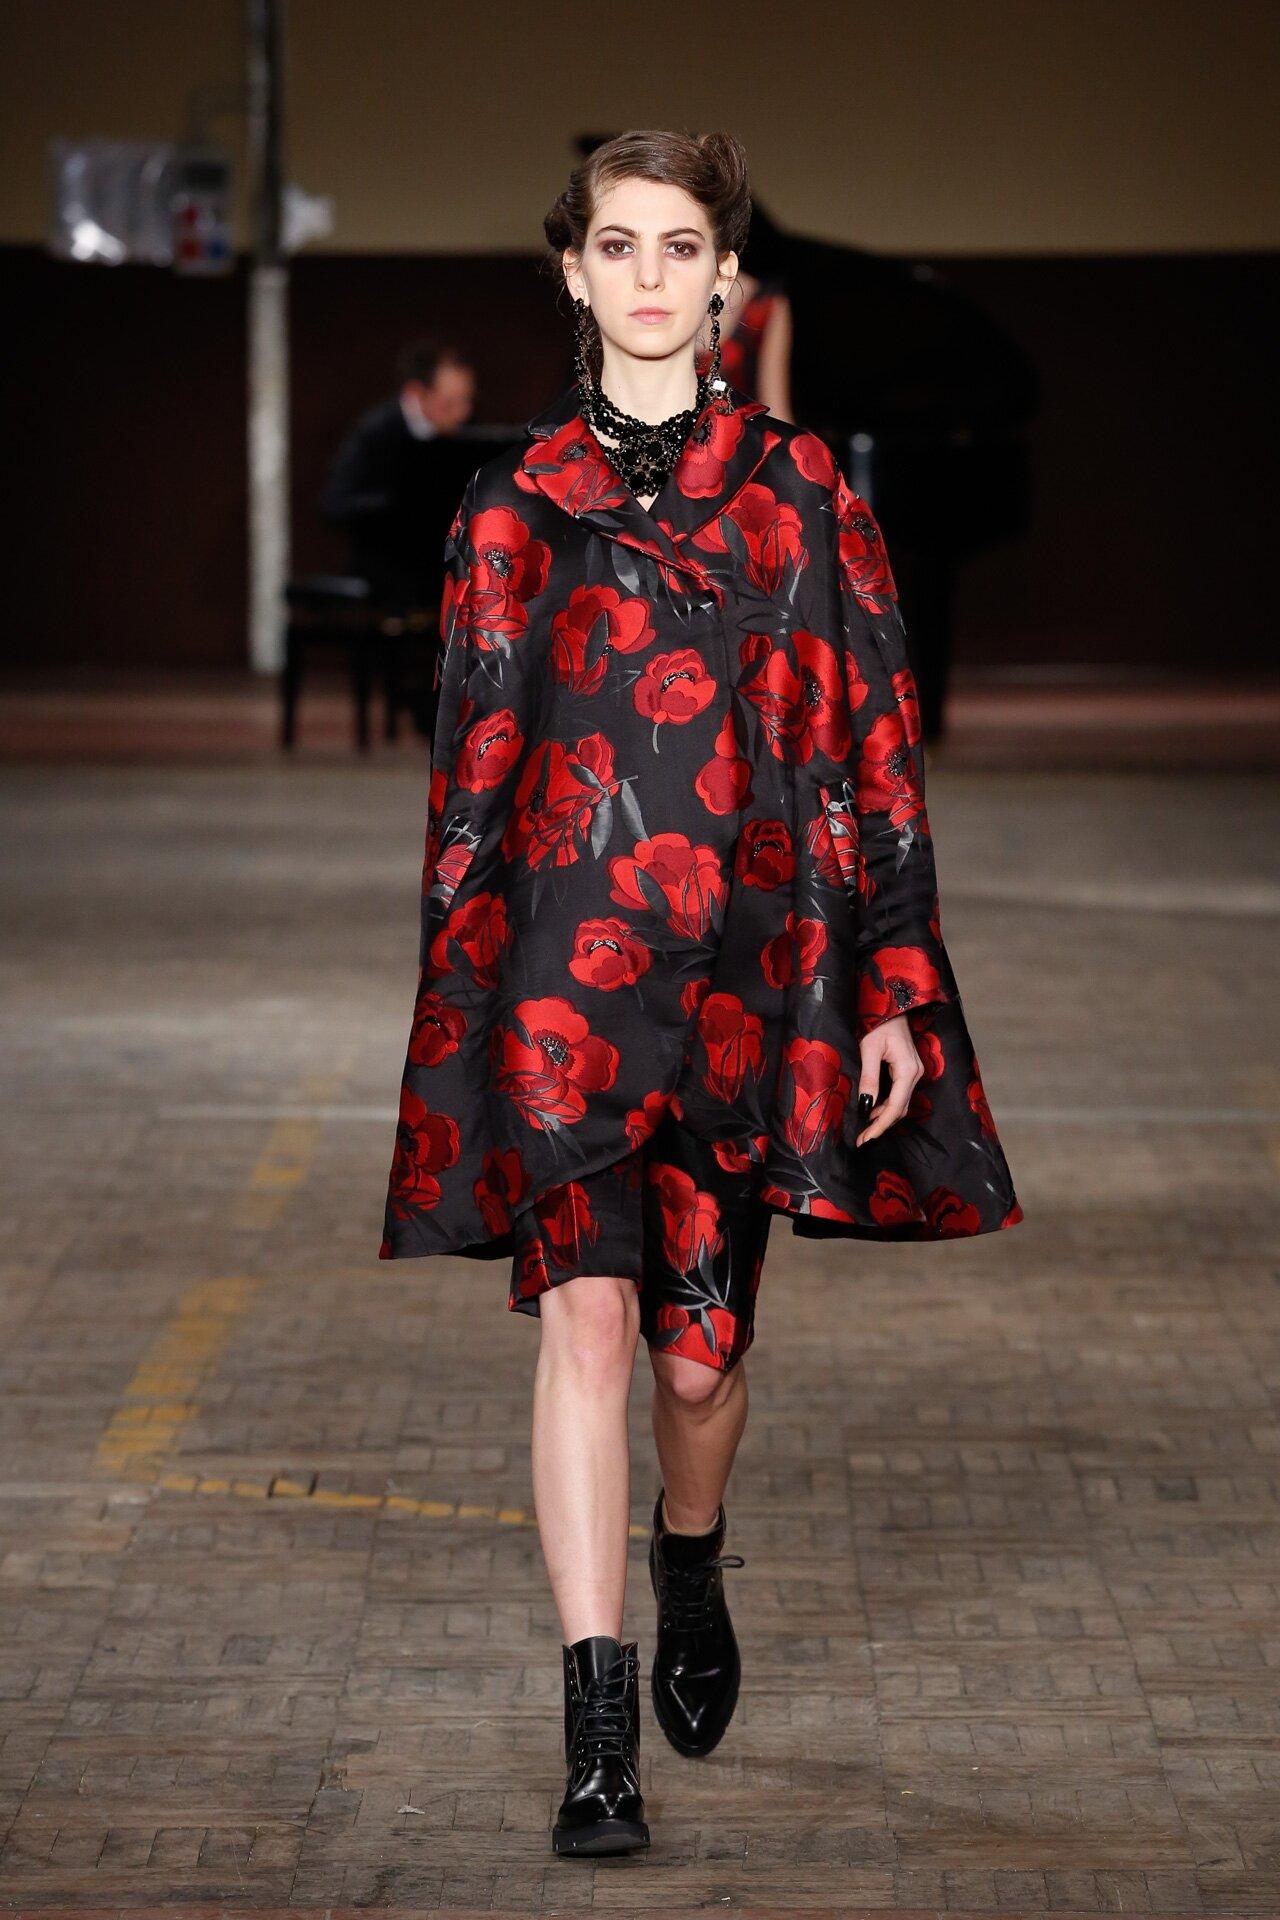 Antonio Marras Fall Winter 2018-19 Fashion Show Look 6